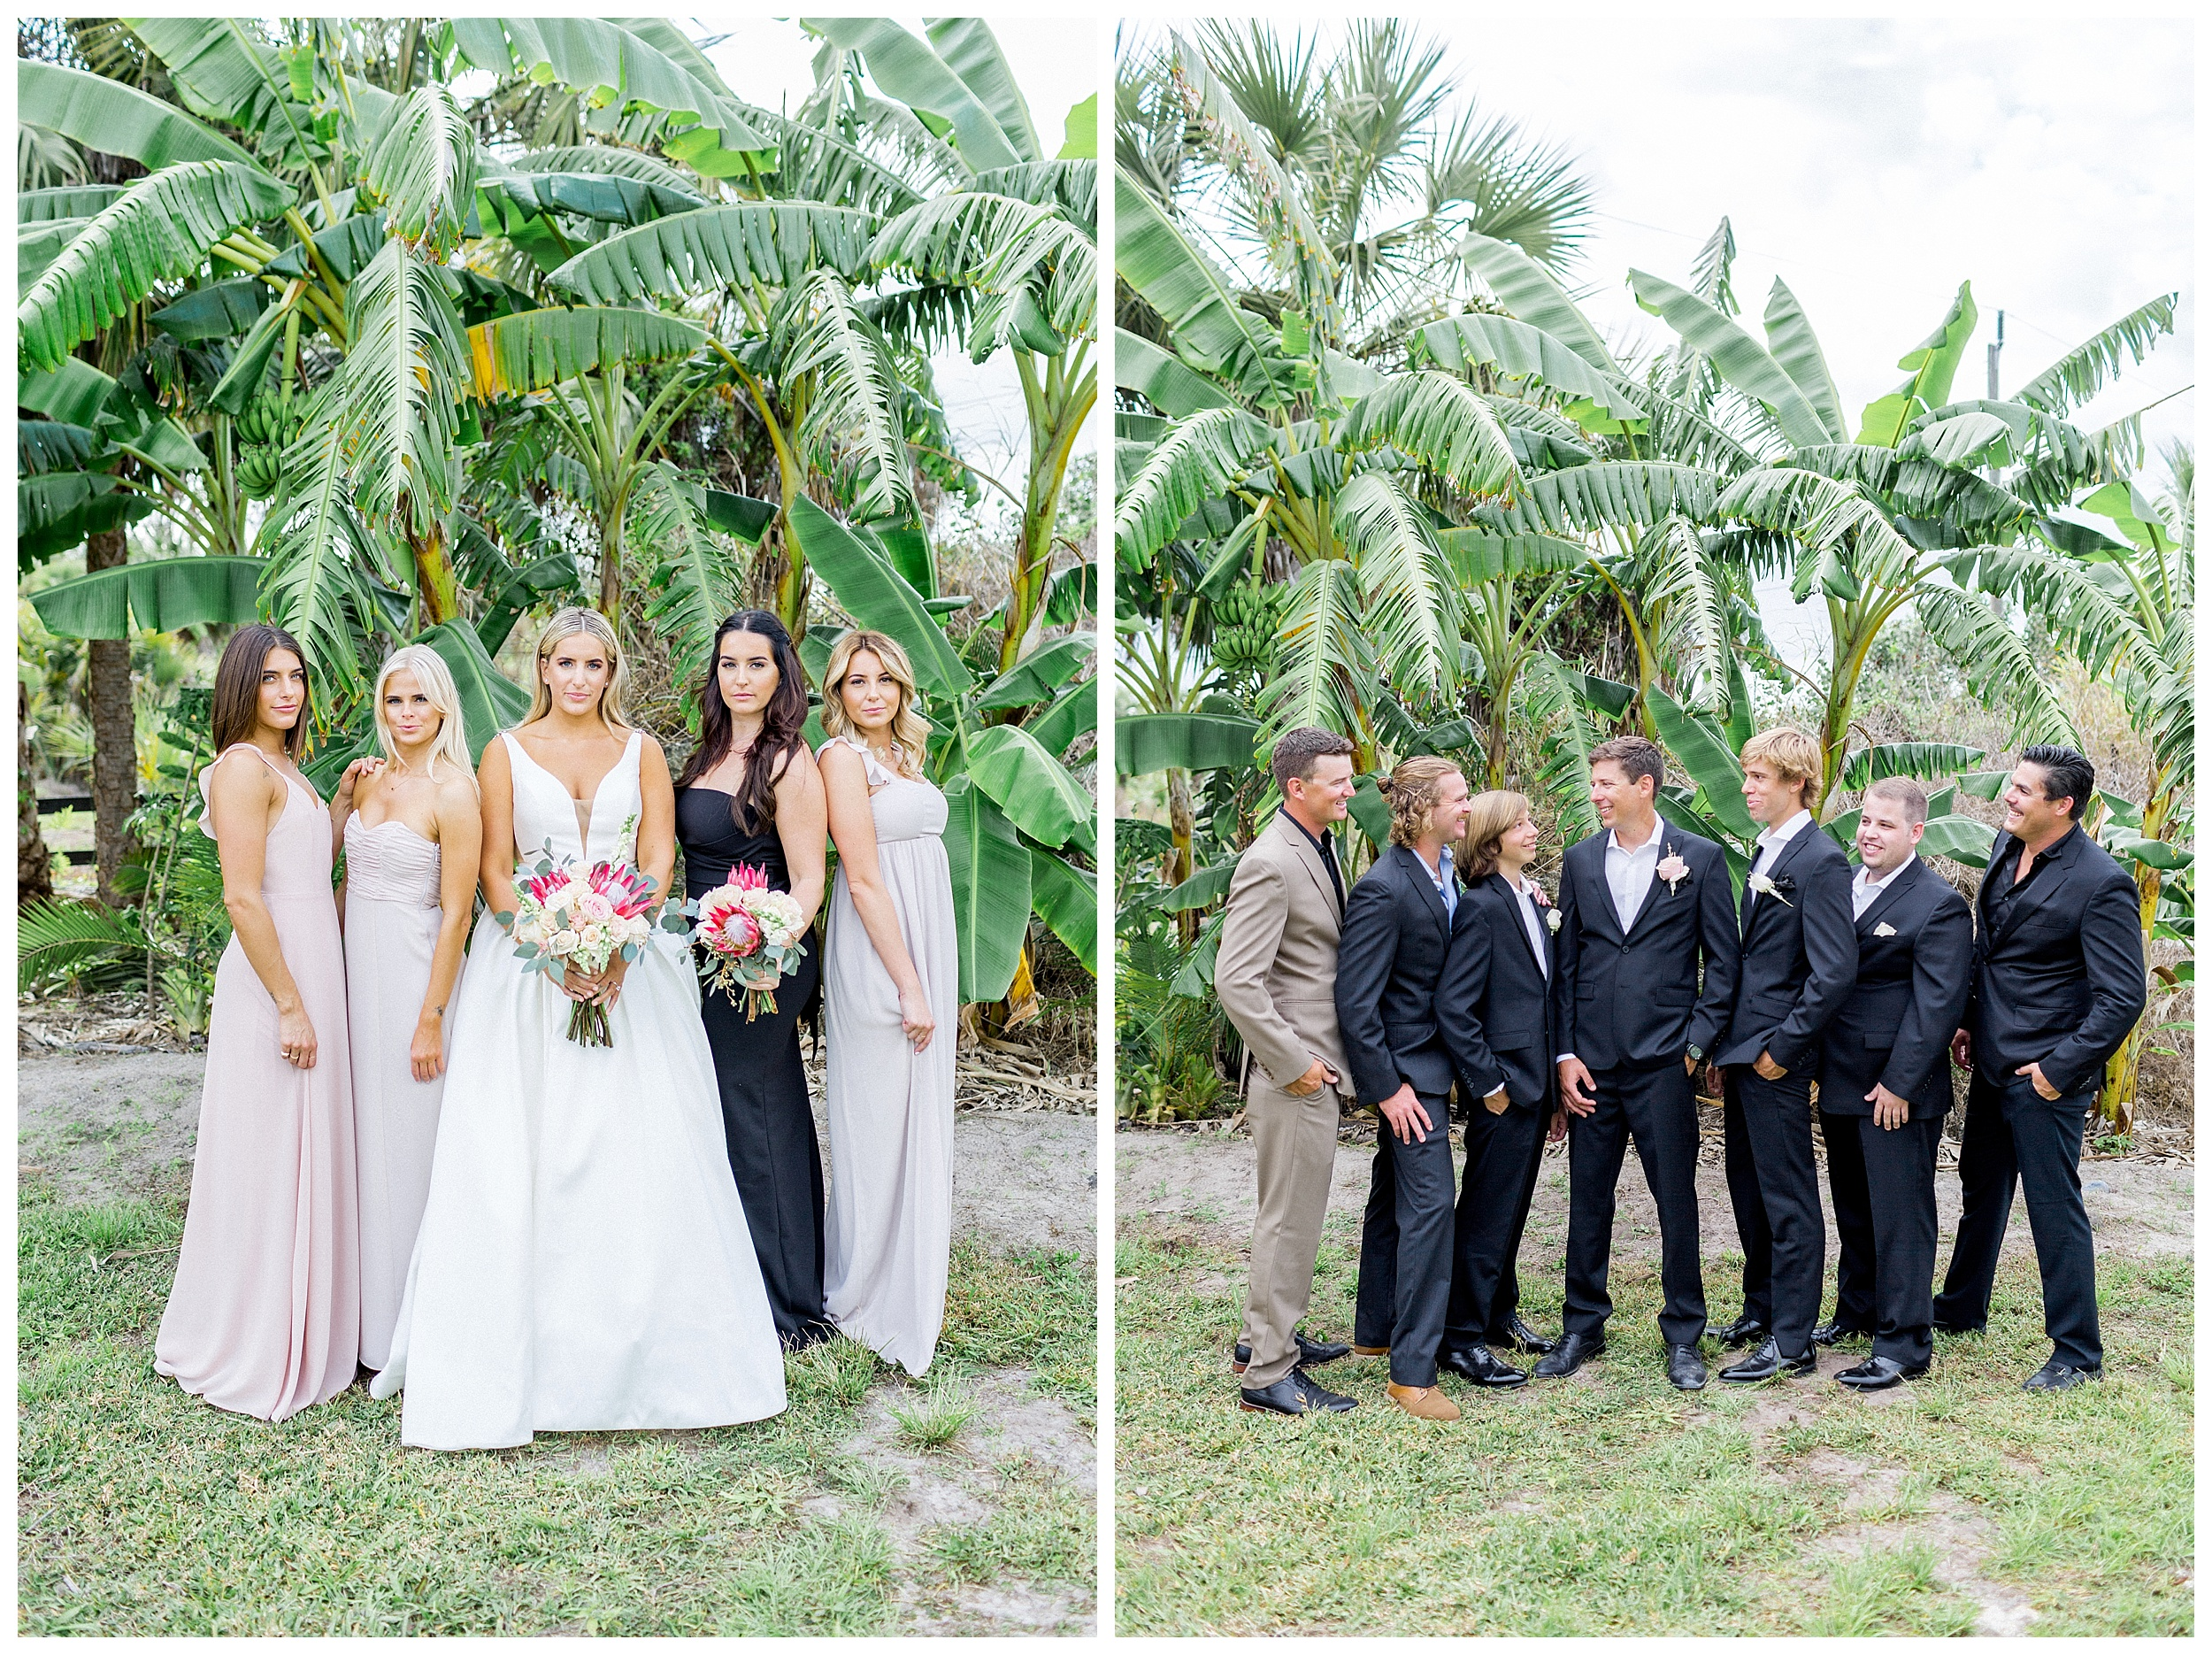 South Florida Wedding Photographer Kir Tuben_0069.jpg